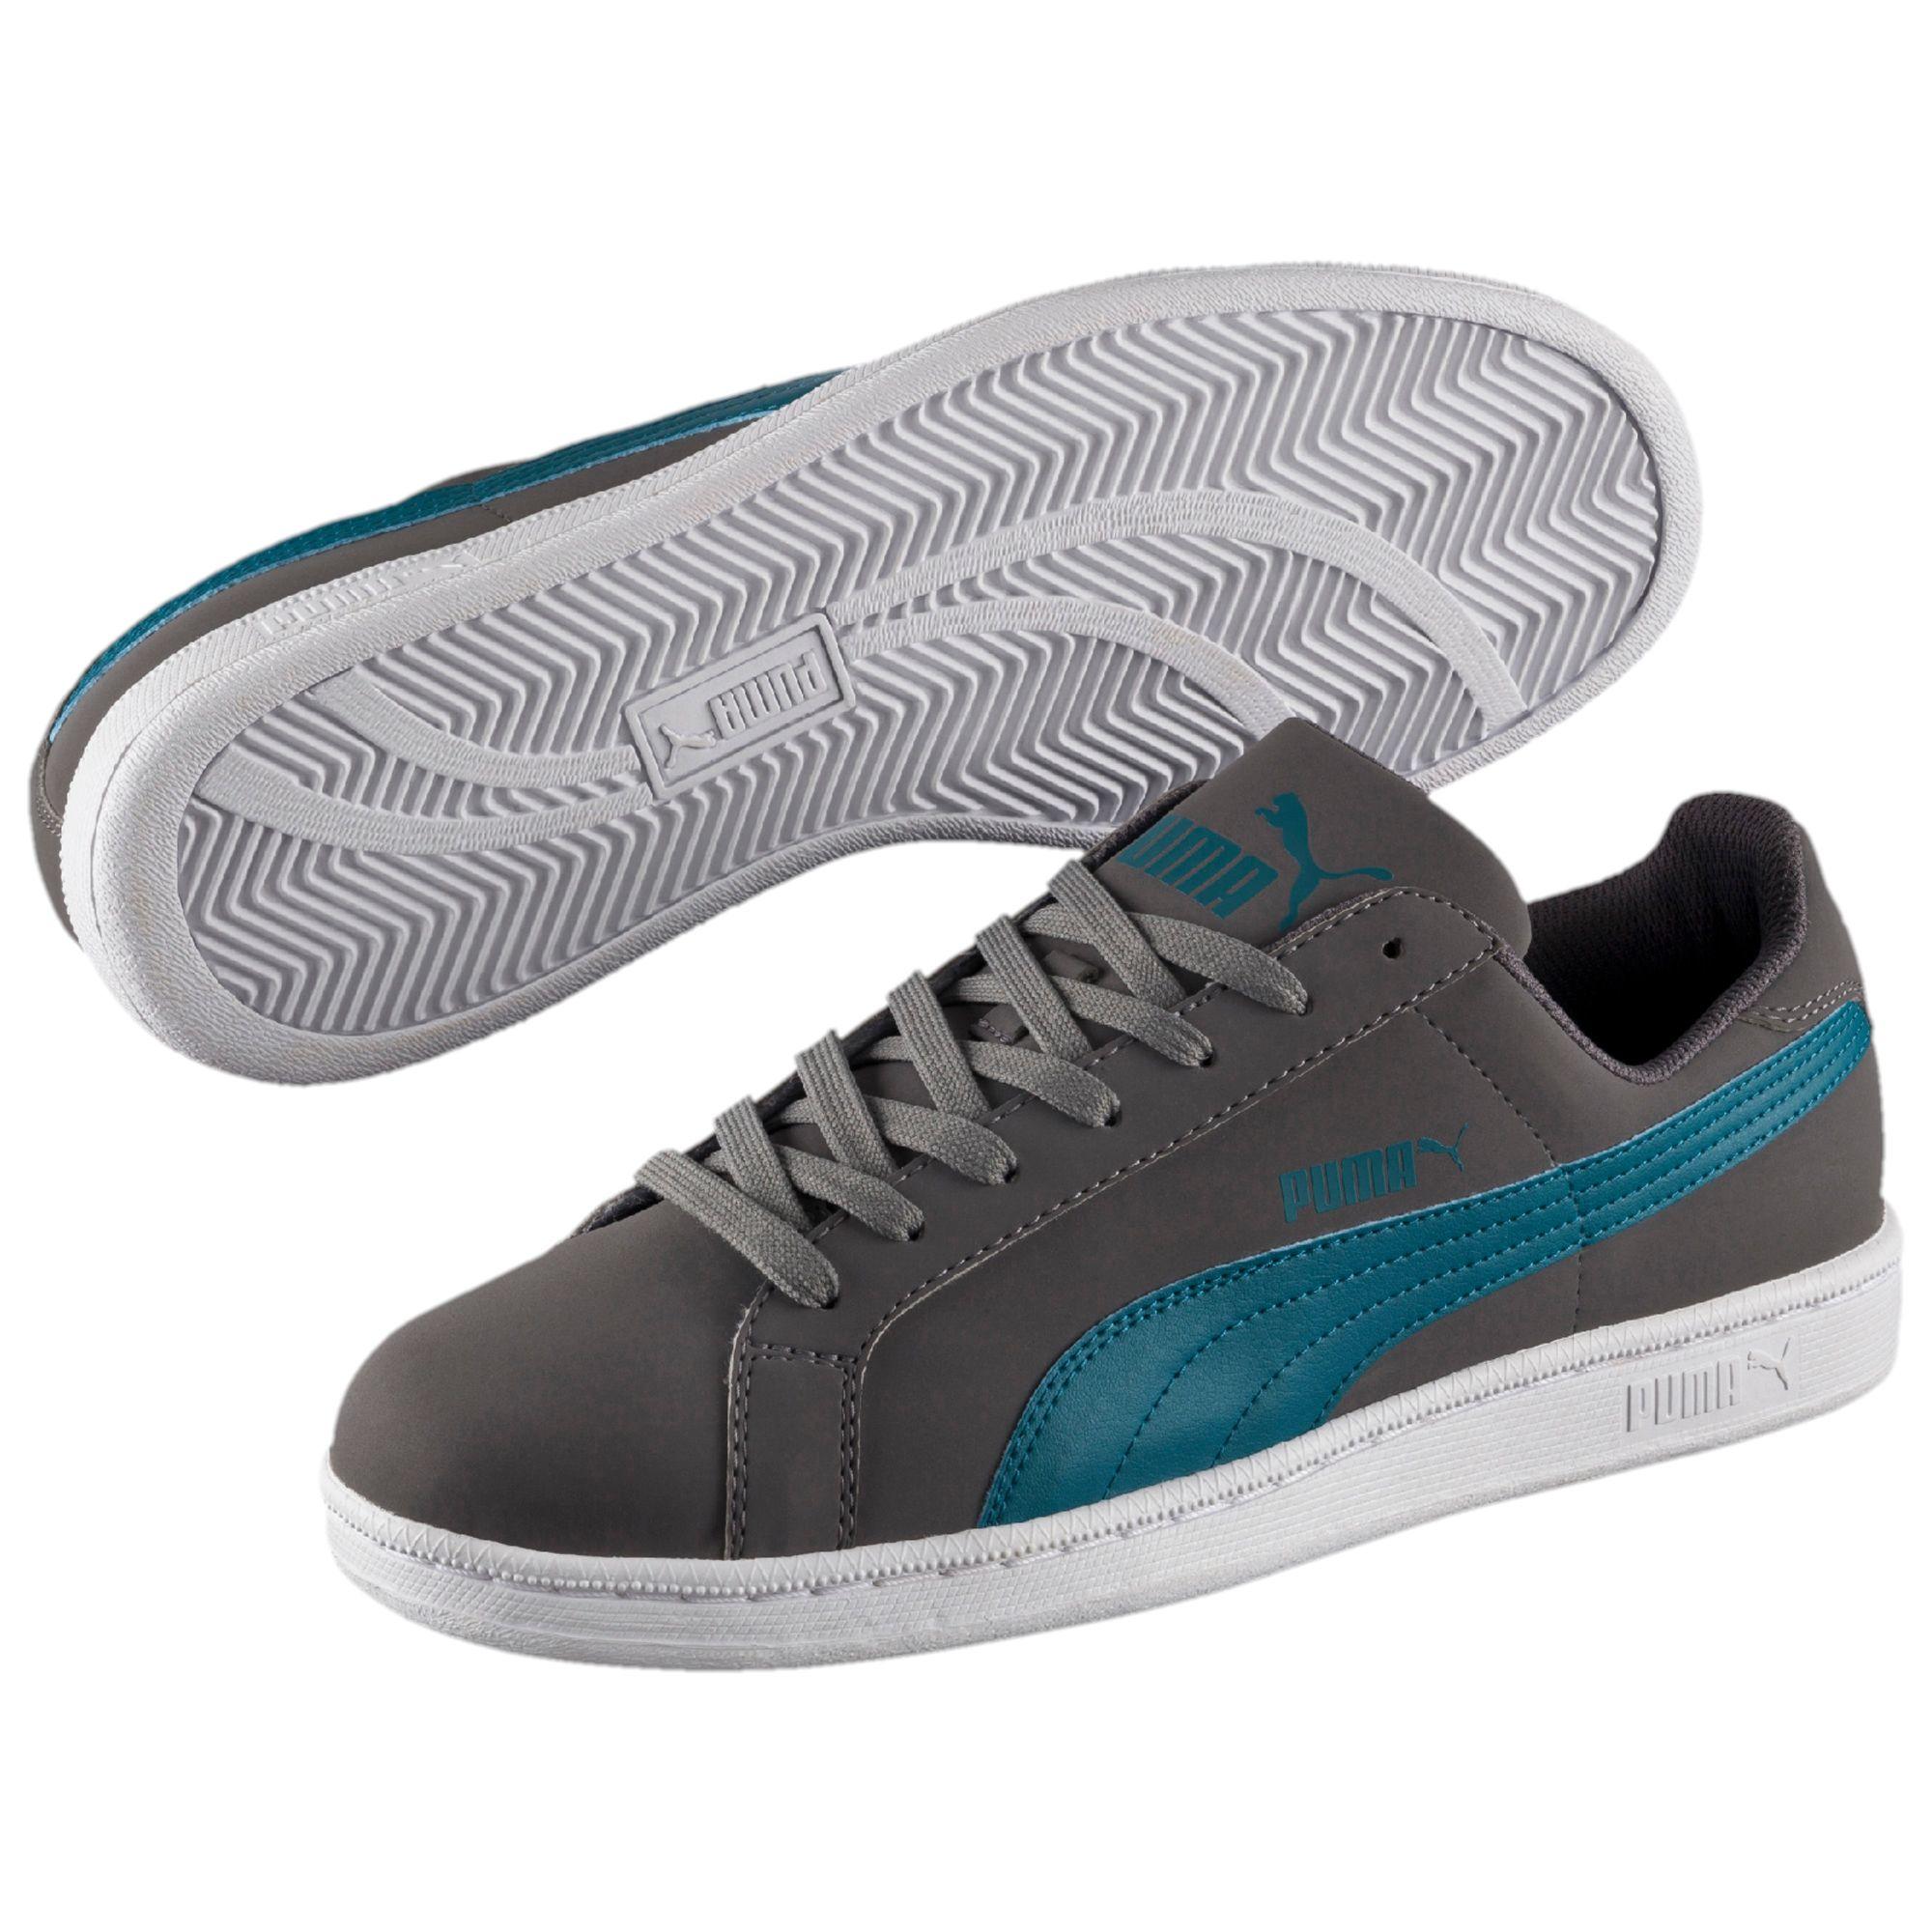 Lyst - PUMA Smash Buck Men s Sneakers in Gray for Men 0fcad506c